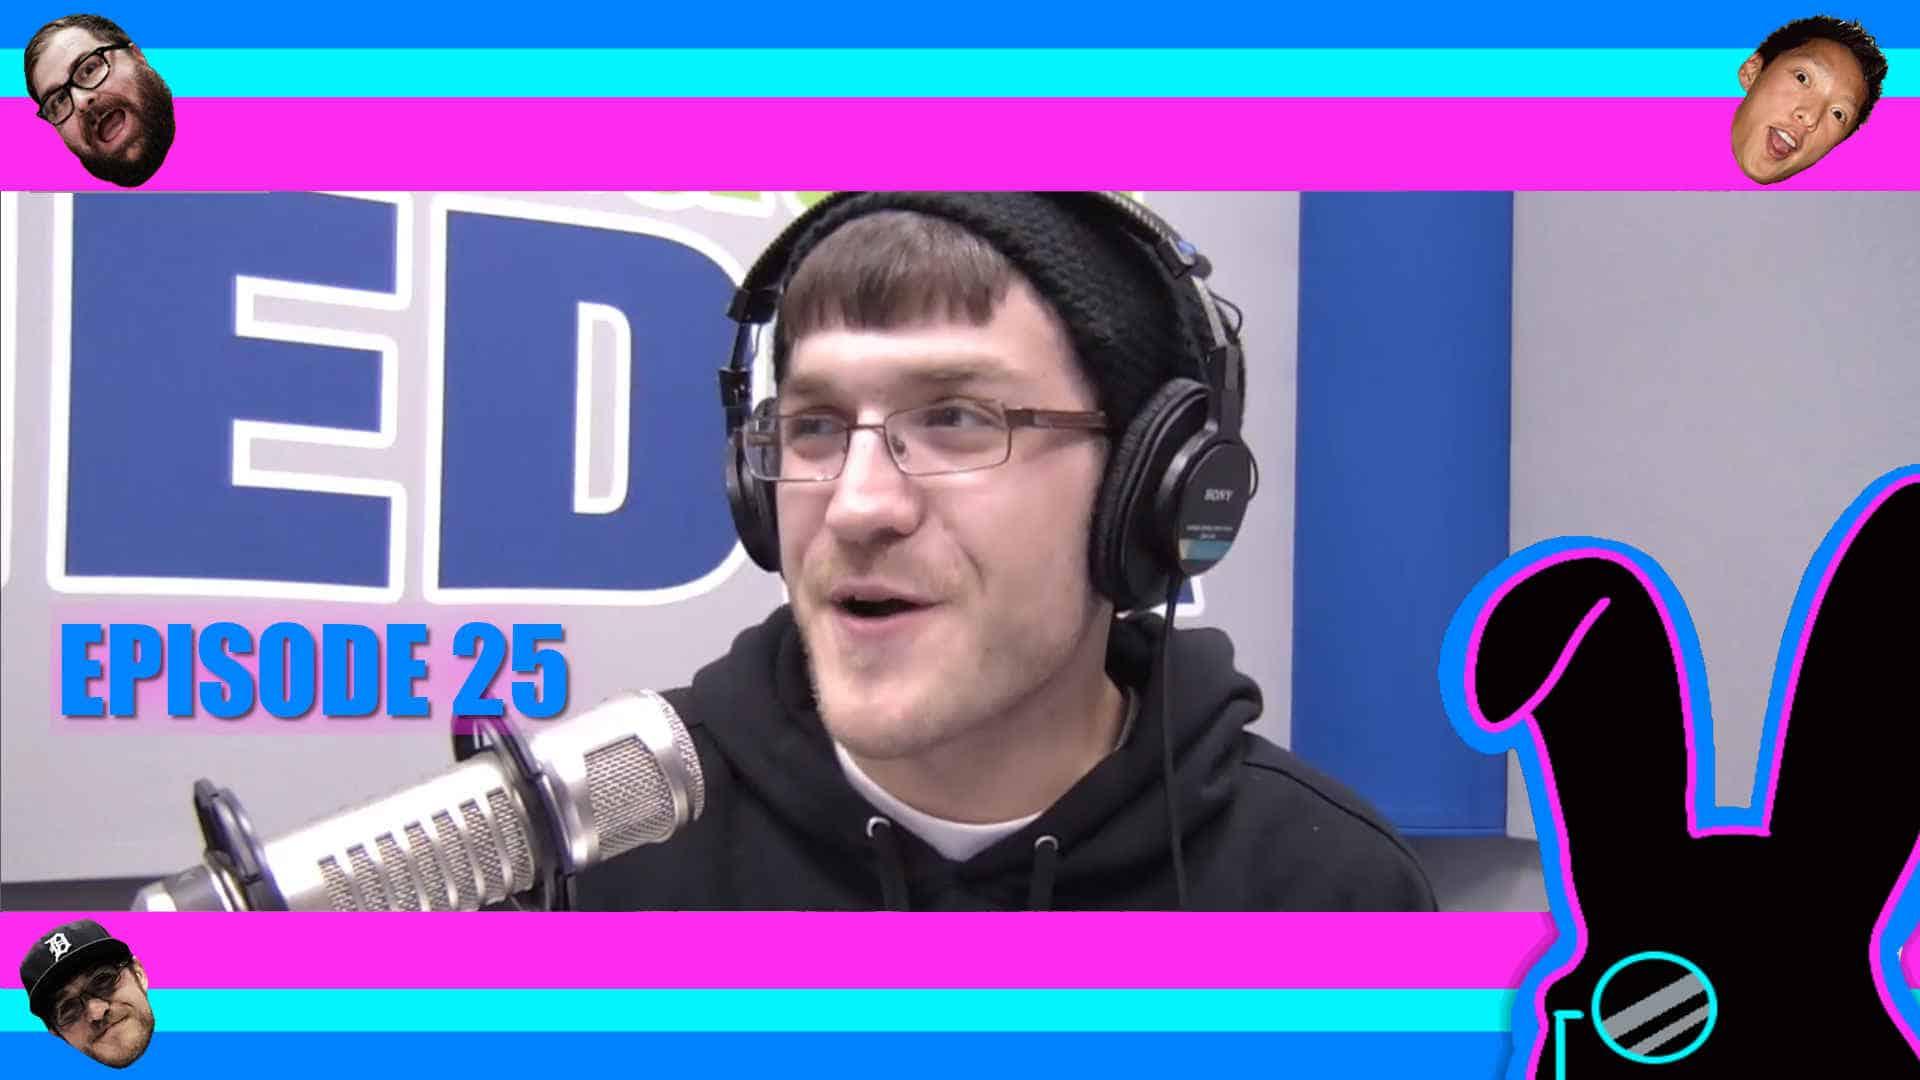 Geektainment Weekly - Episode 25